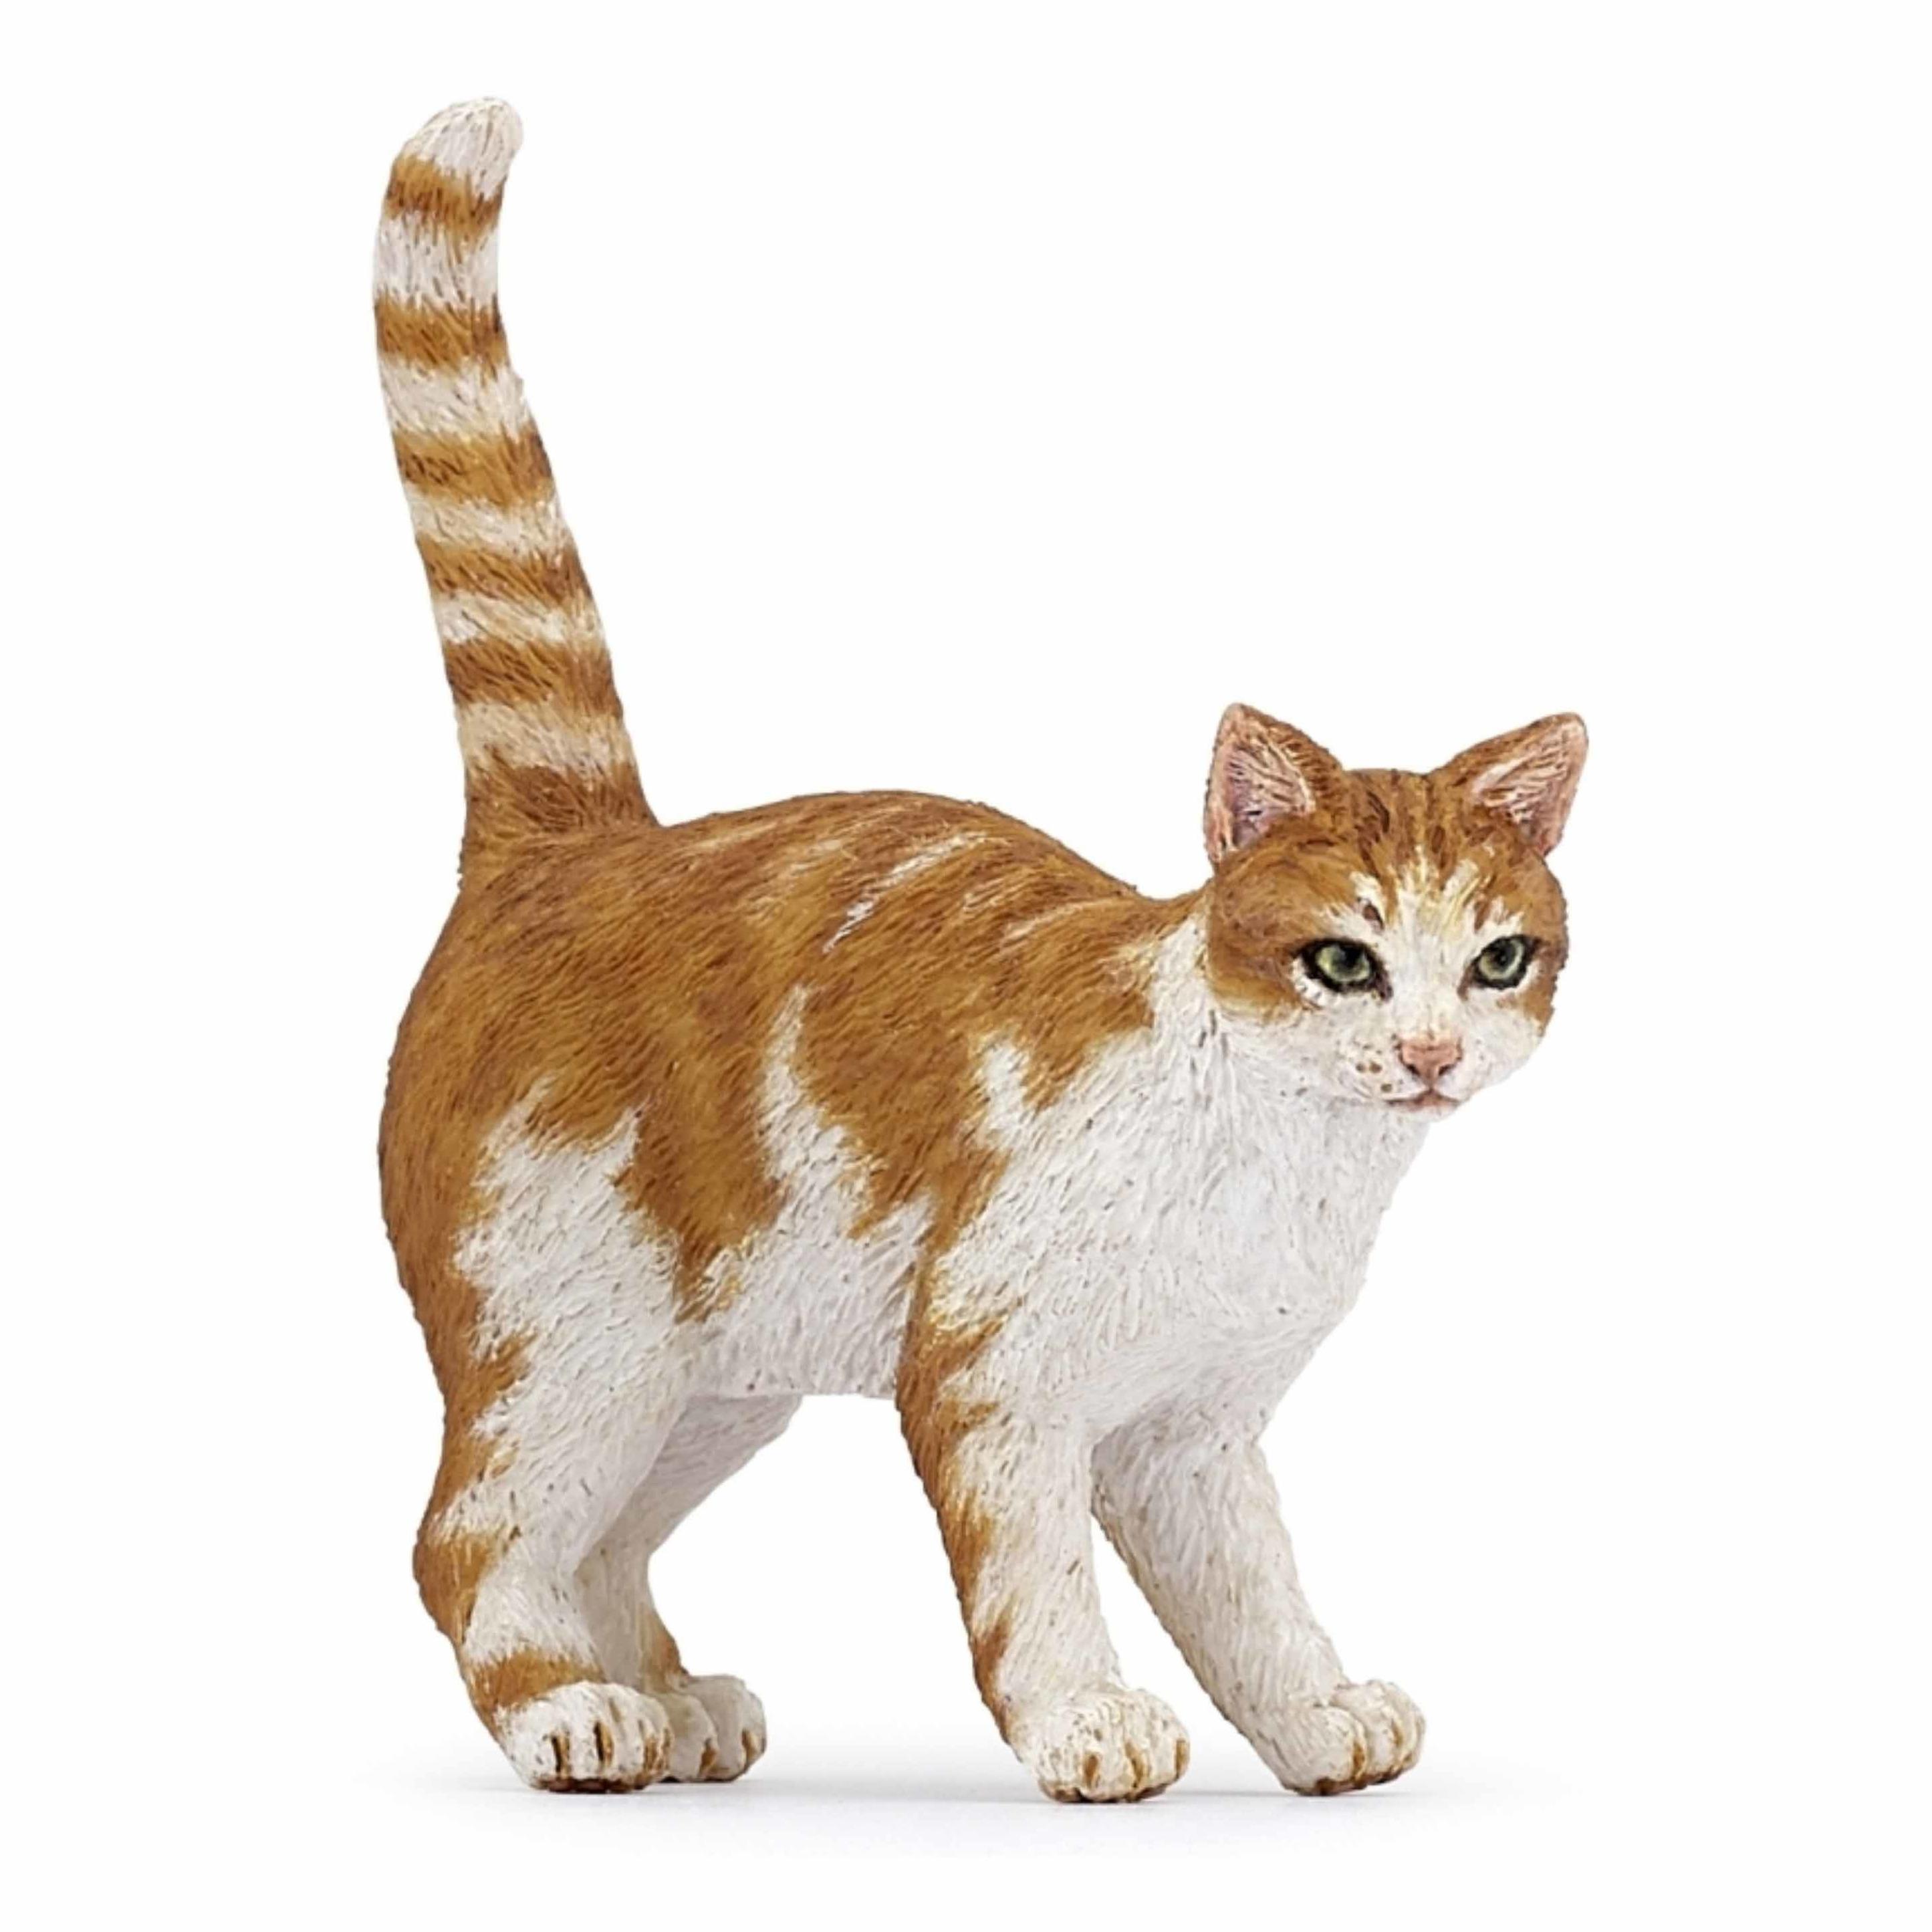 Plastic kat / poes speelgoed diertje 5 cm